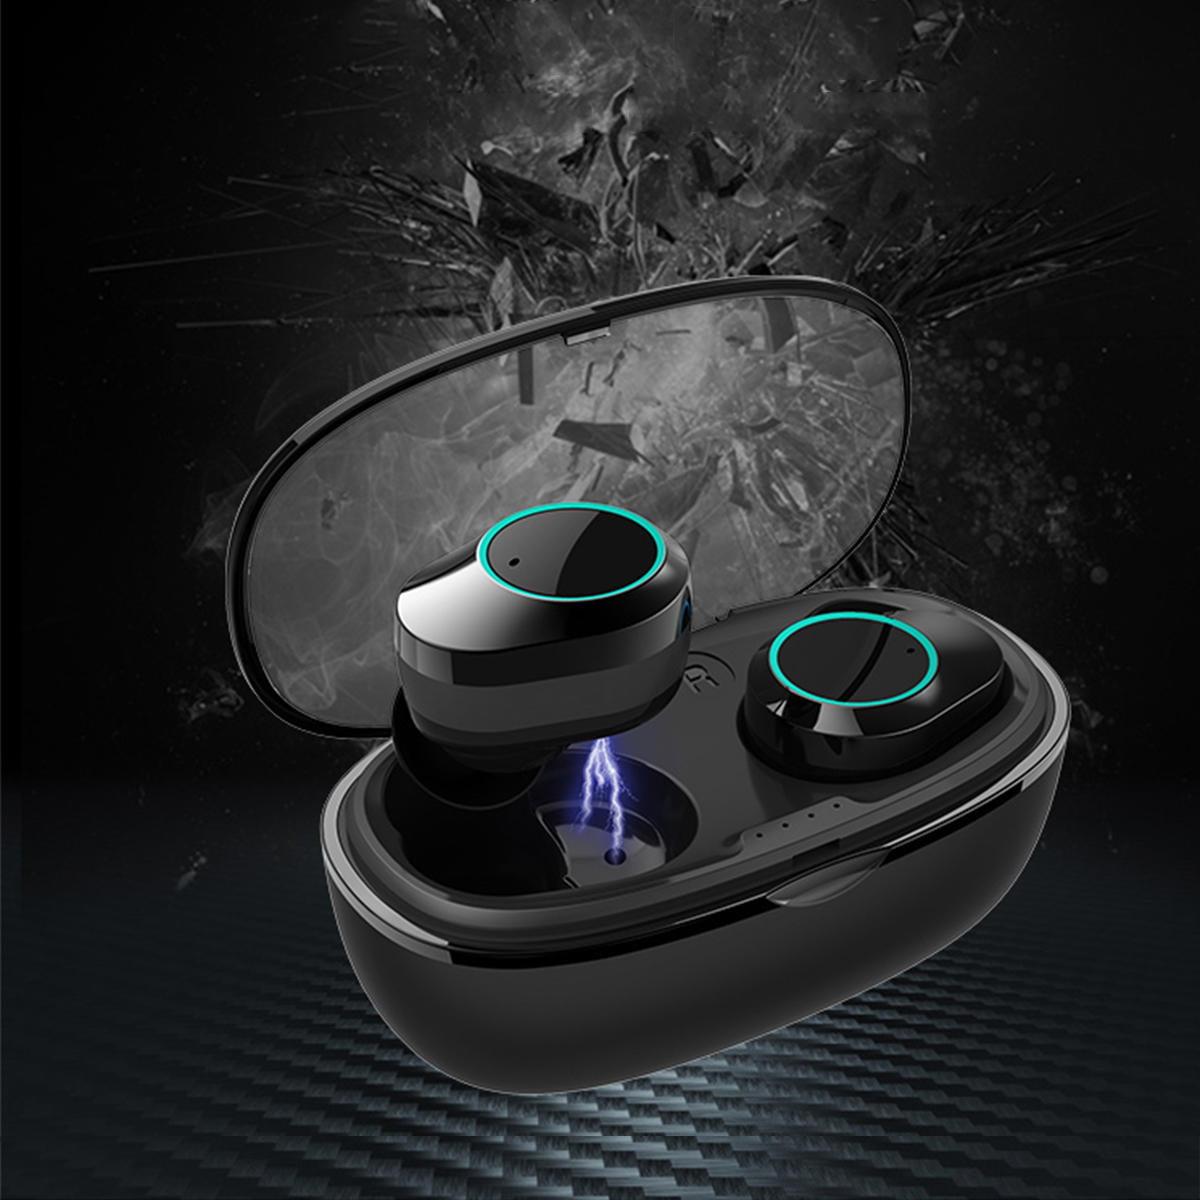 T2C TWS Bluetooth 5.0 earphone hifi stereo type-c charging case wholesale china 1 (10)